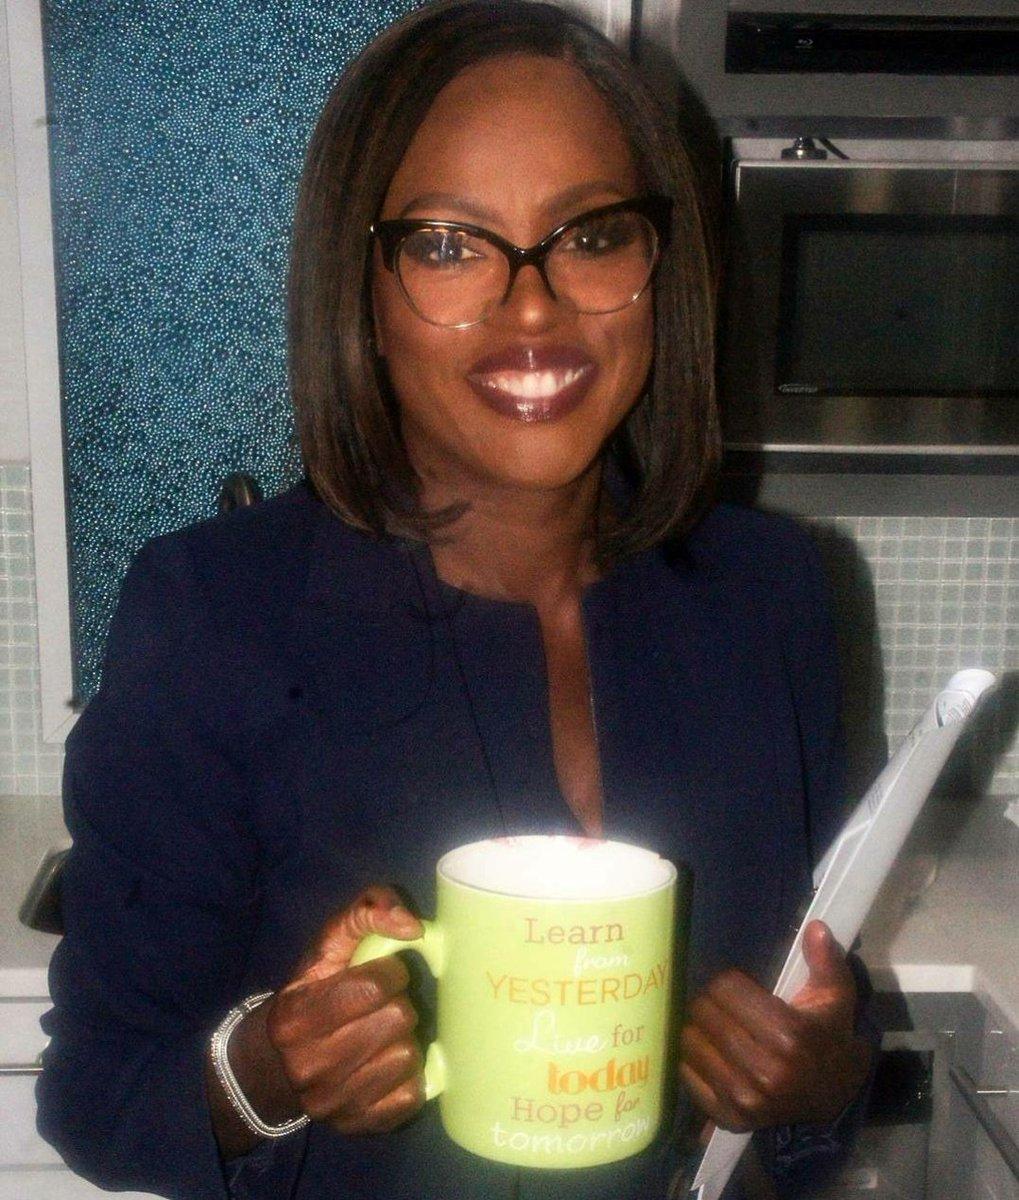 RT @violadavis: Happy #TGIT! Who's live tweeting with me tonight? #GreysAnatomy #Scandal #HTGAWM https://t.co/qQMKmKeofG